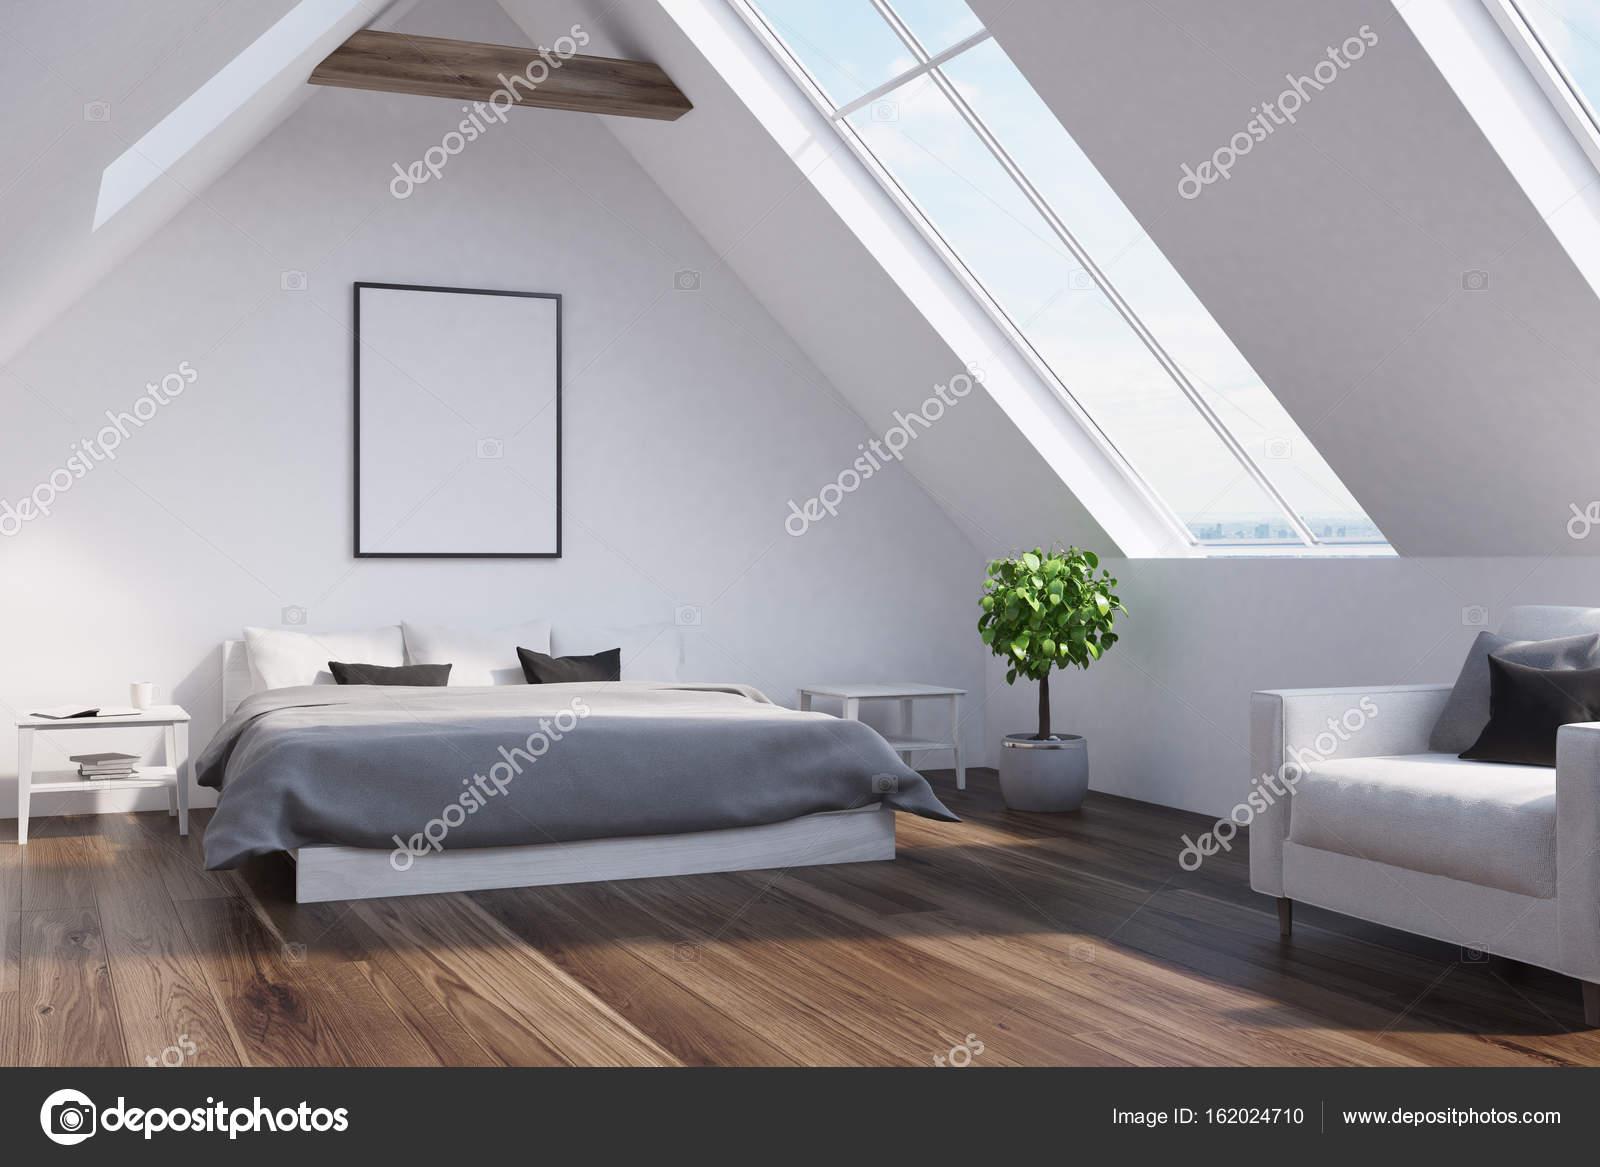 Dachgeschoss Schlafzimmer mit grauen Bett, Plakat, Seite — Stockfoto ...